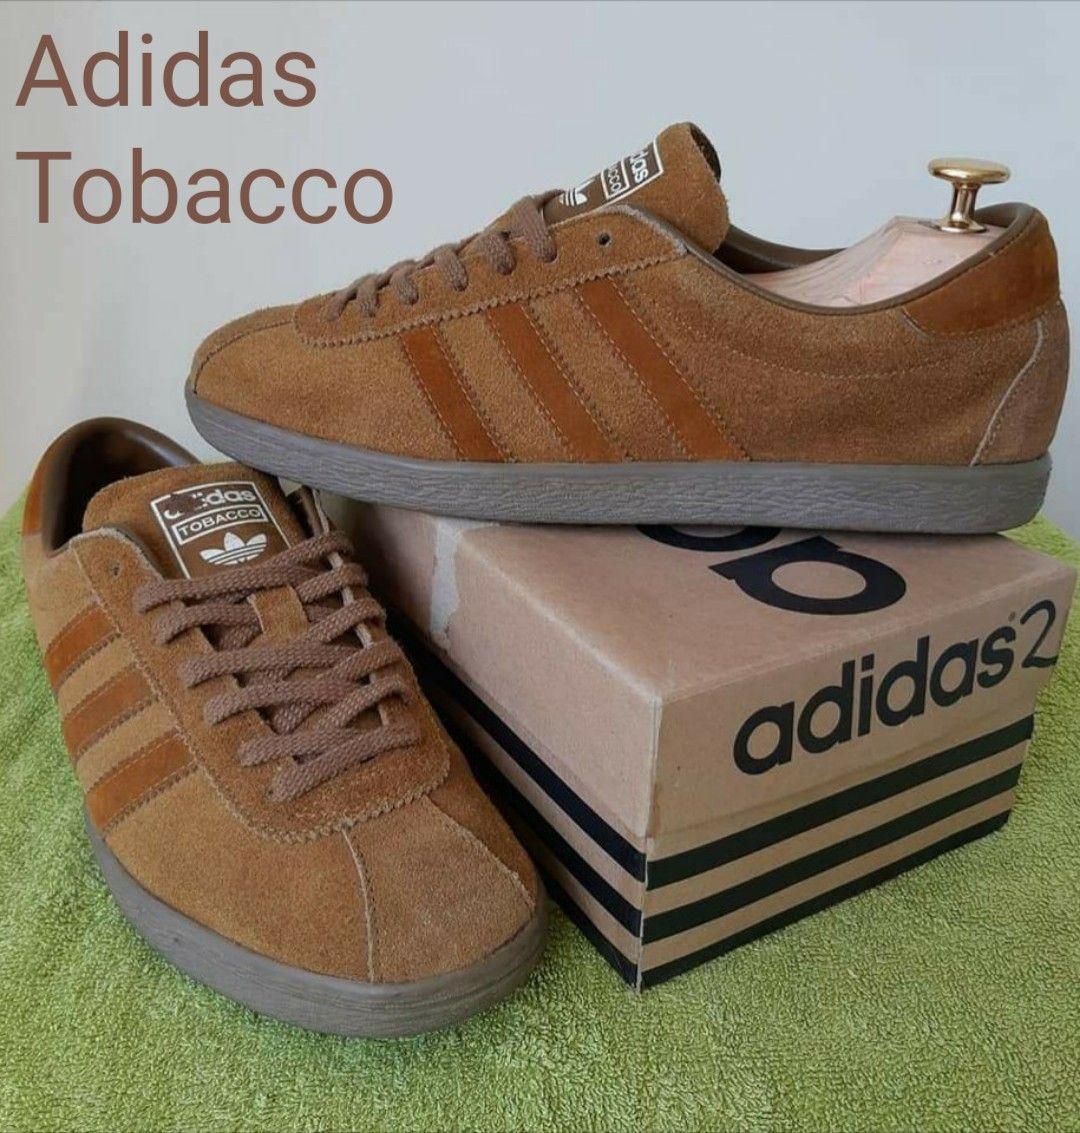 A gorgeous pair of vintage Adidas